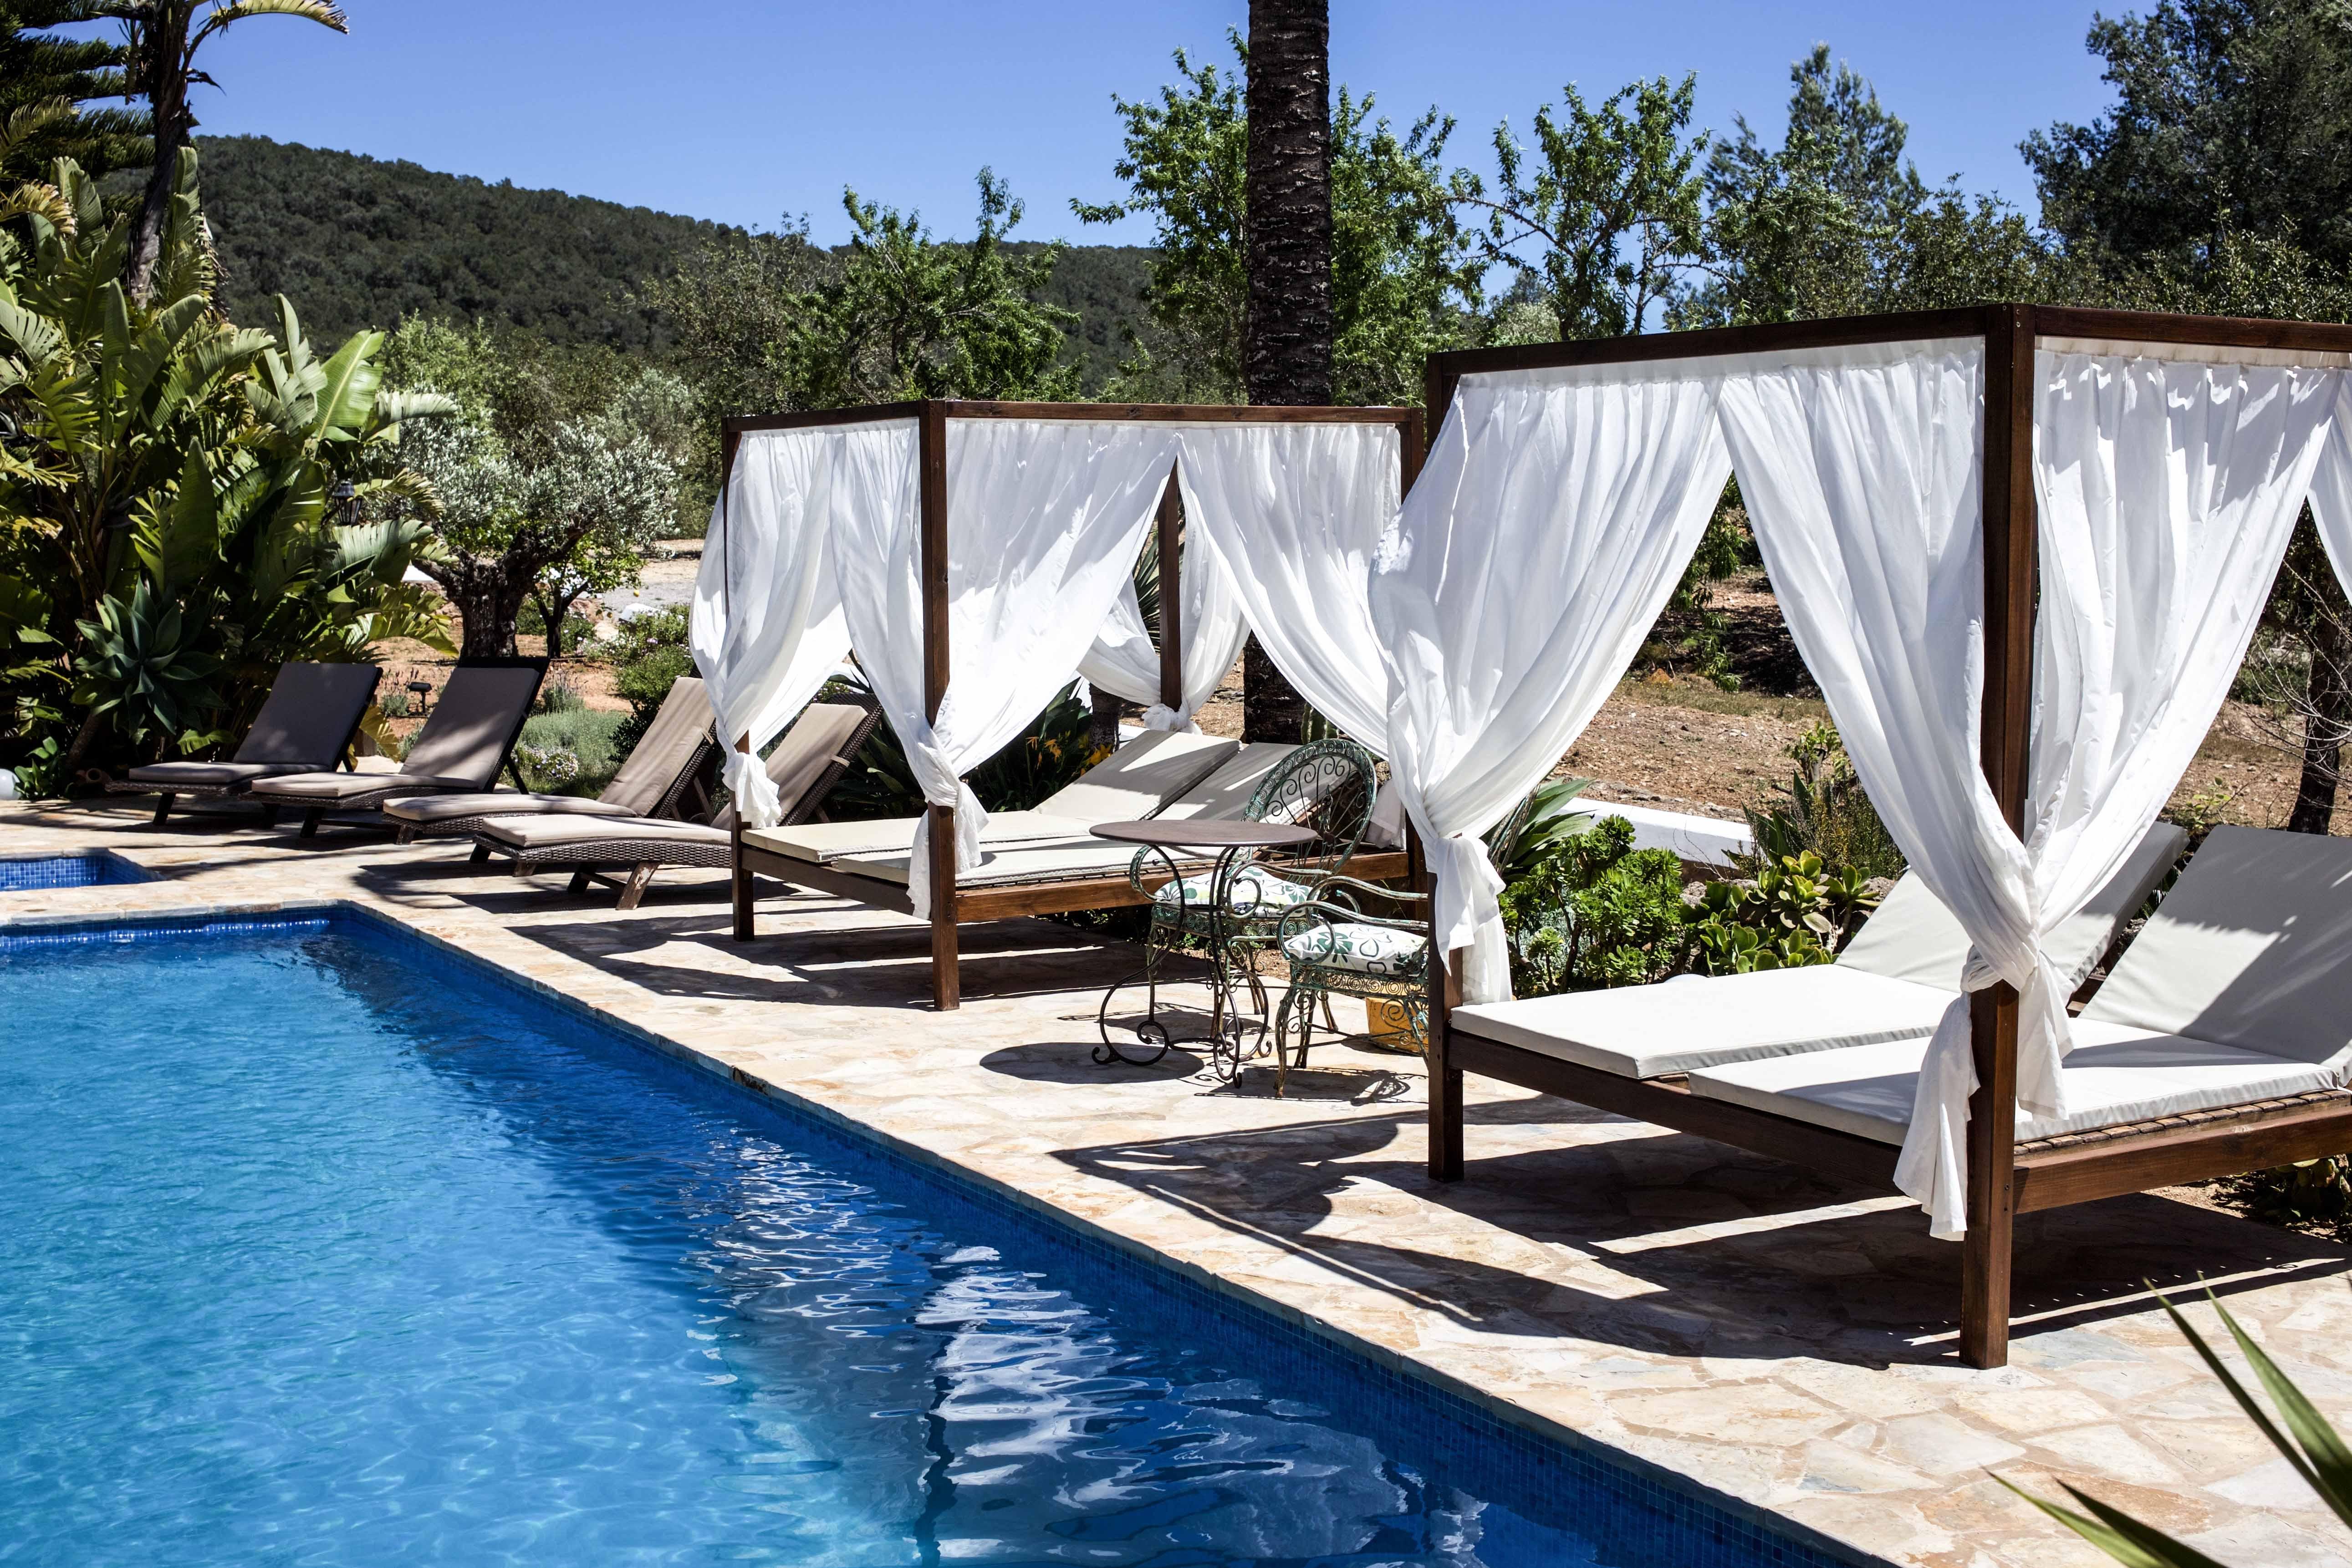 travelblog-reiseblog-ibiza-kurztrip-mädelstrip-luxus-villa_9134